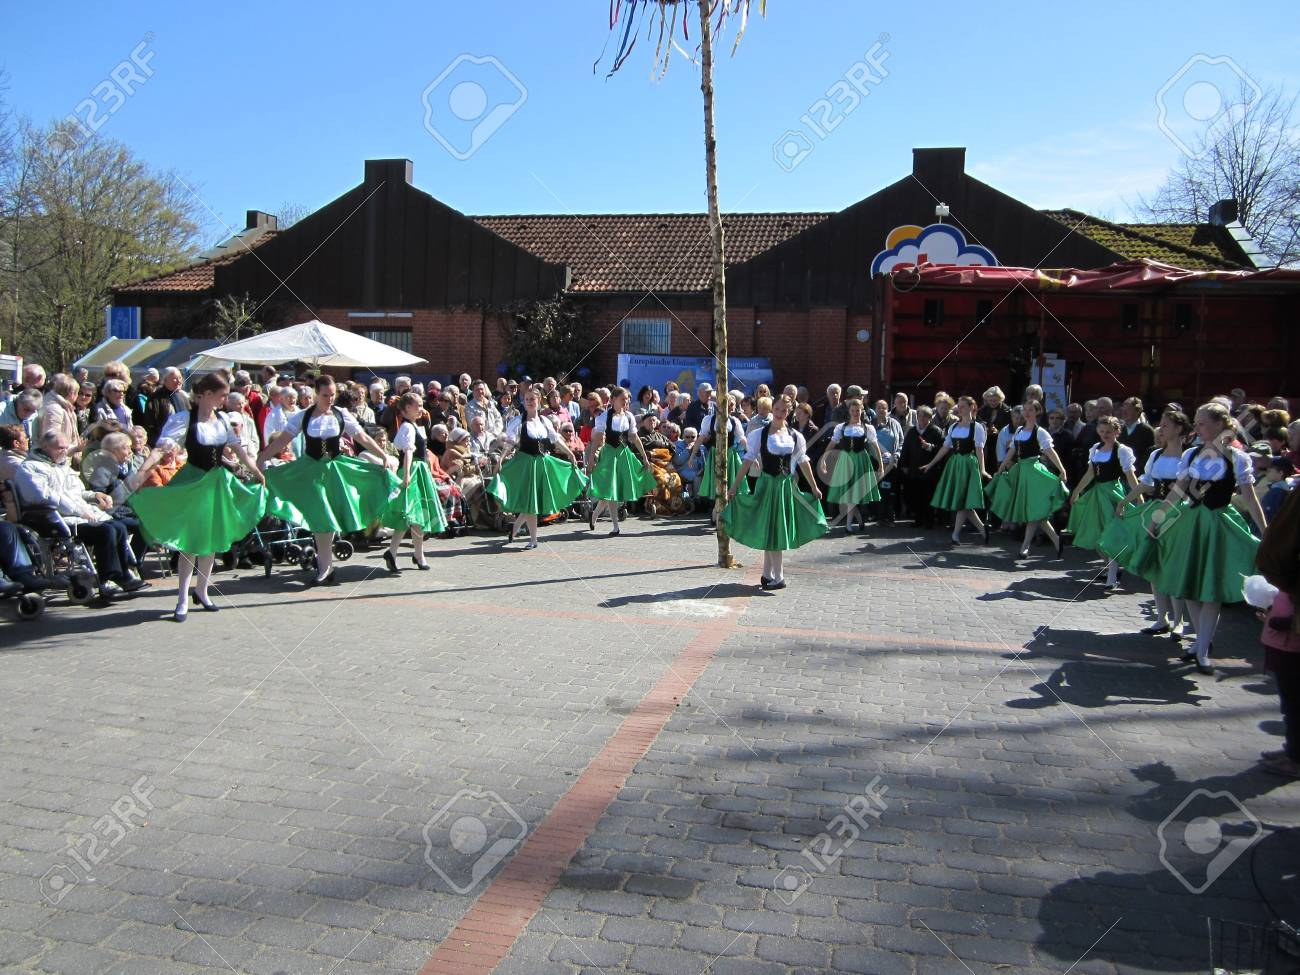 Dancing around the maypole Stock Photo - 24048097